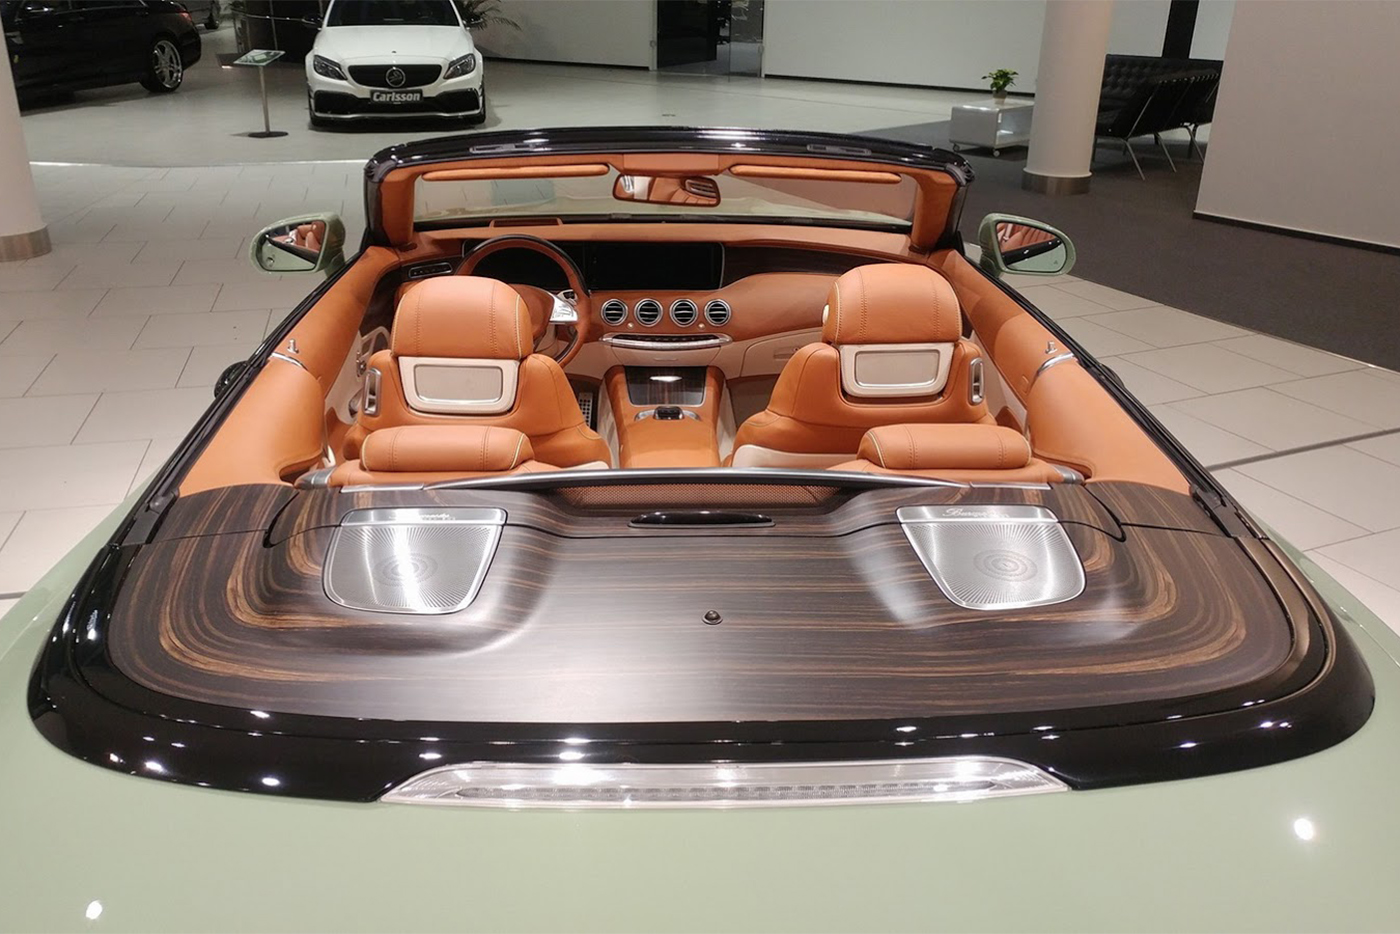 mercedes-s-class-cabriolet-diospyros-5.jpg